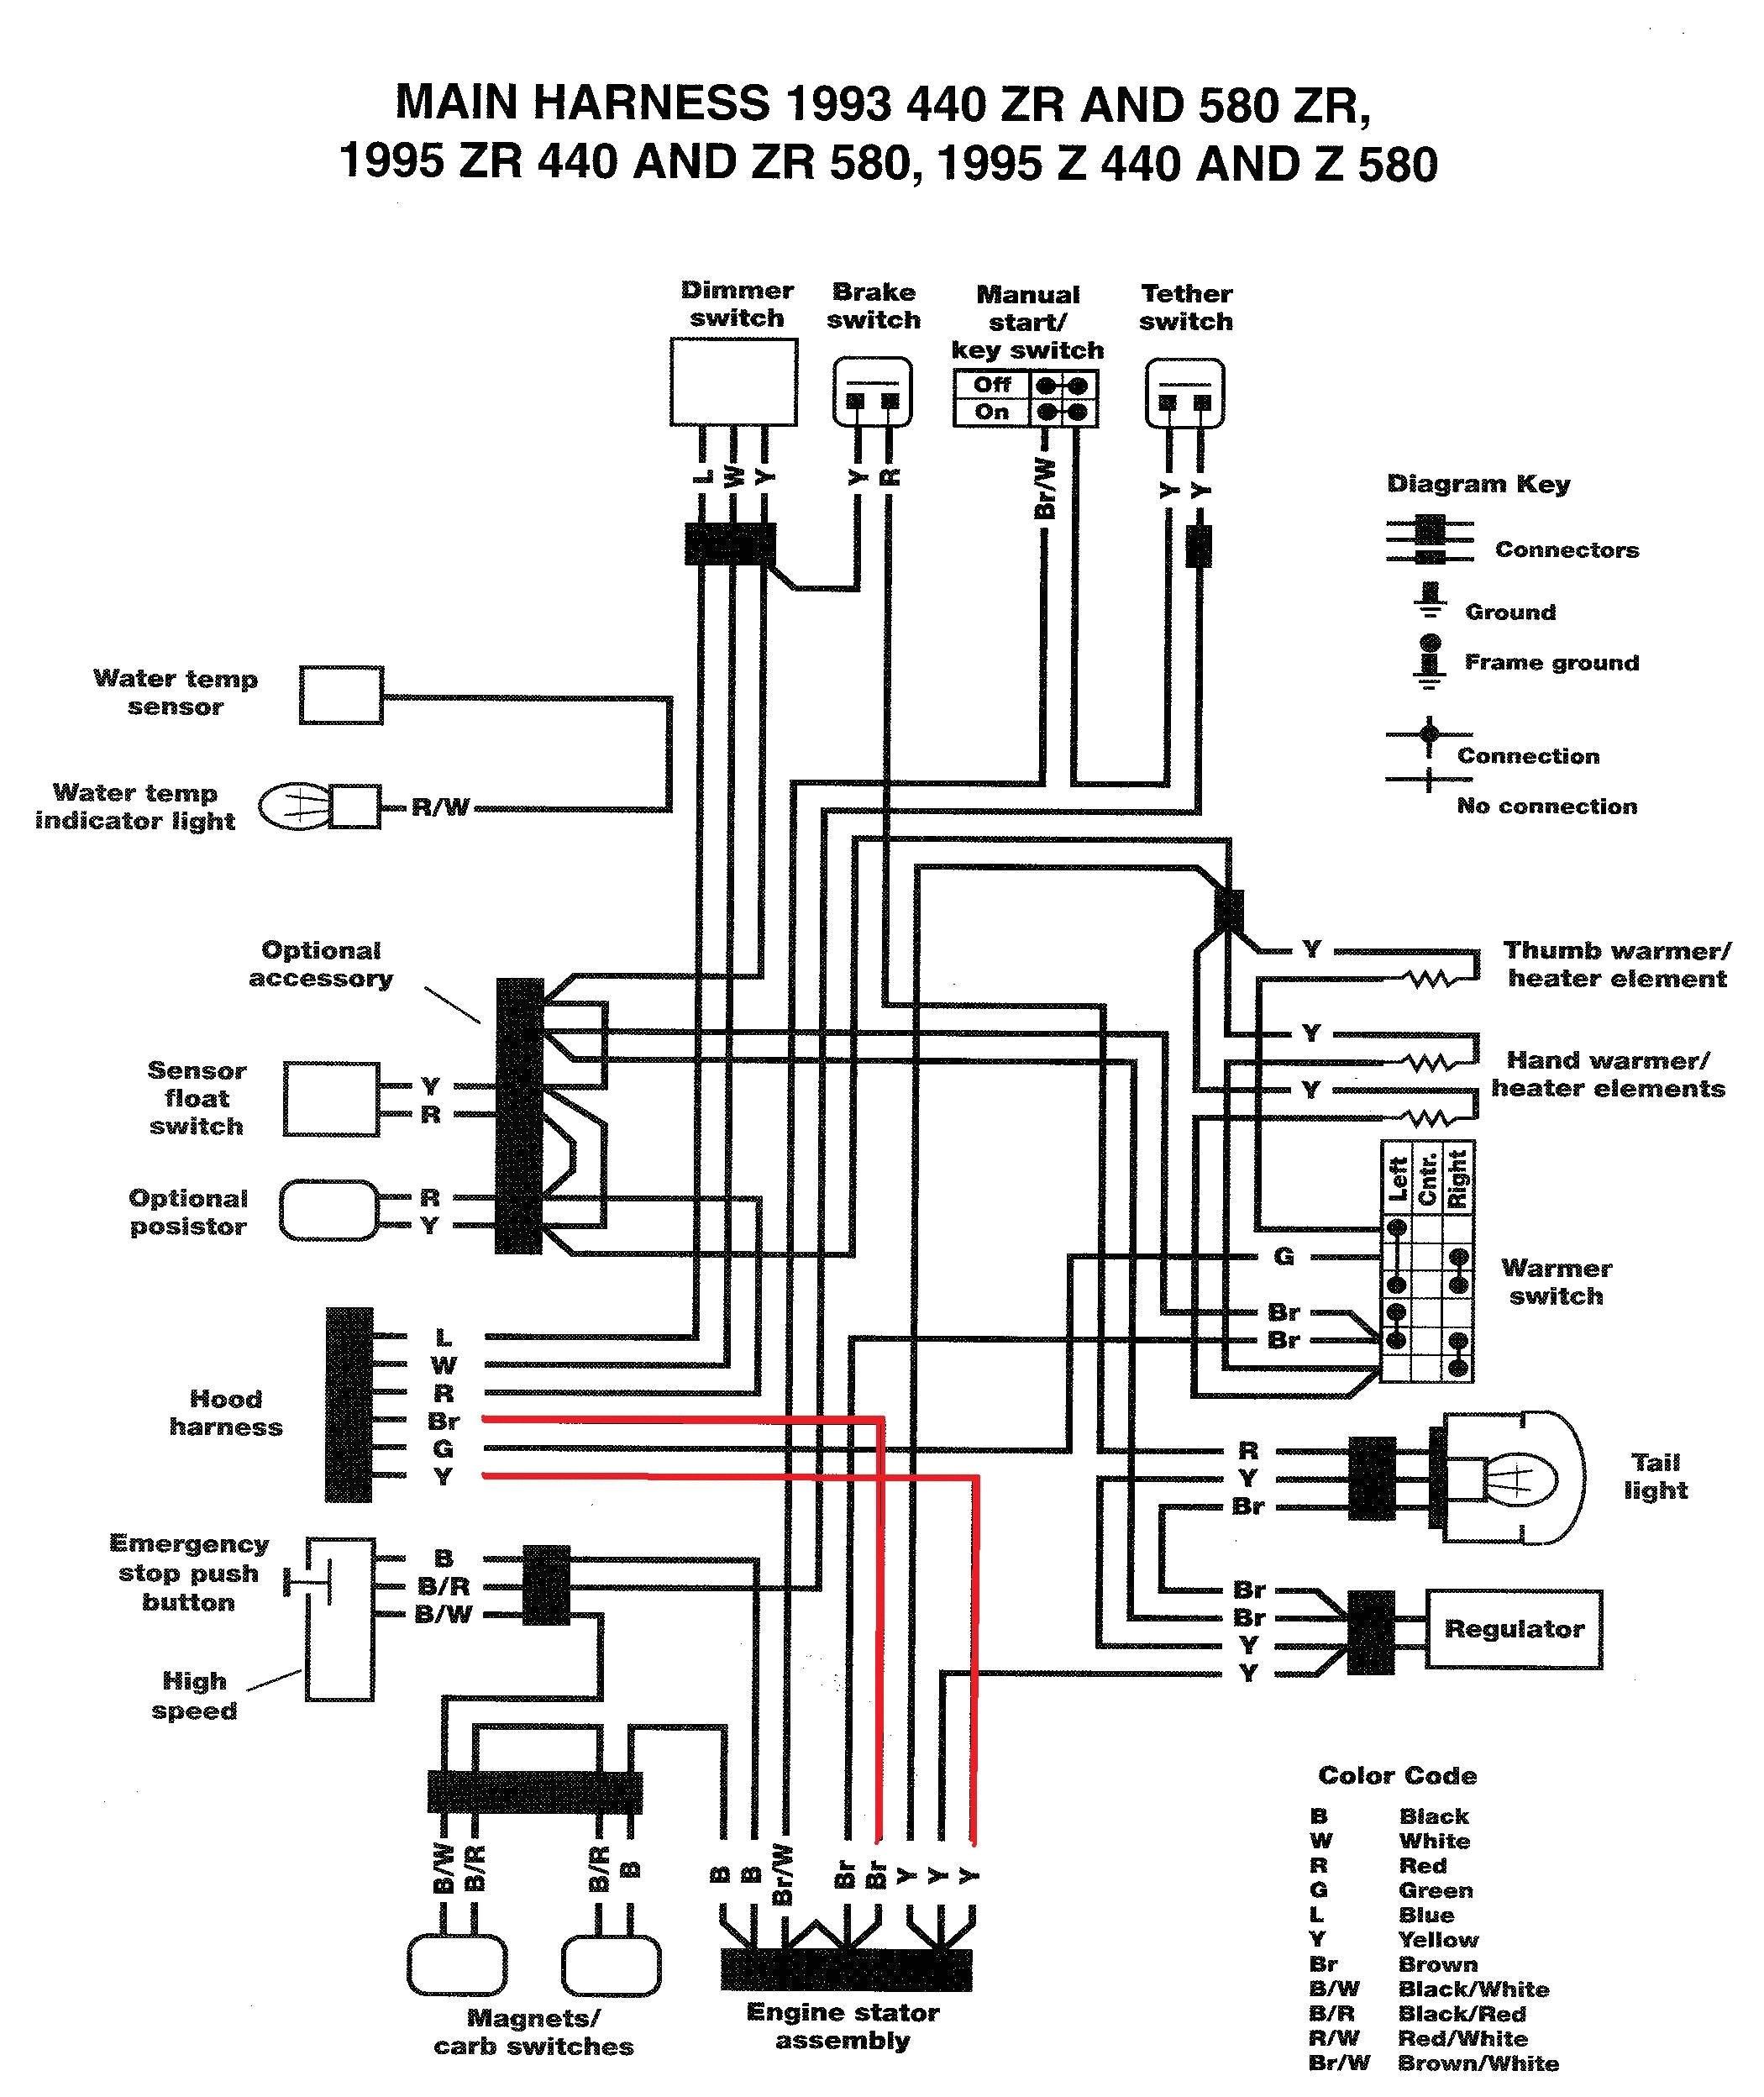 yamaha big bear 350 wiring diagram awesome switch wiring diagram for yamaha big bear 4x4 wire center e280a2 of yamaha big bear 350 wiring diagram jpg